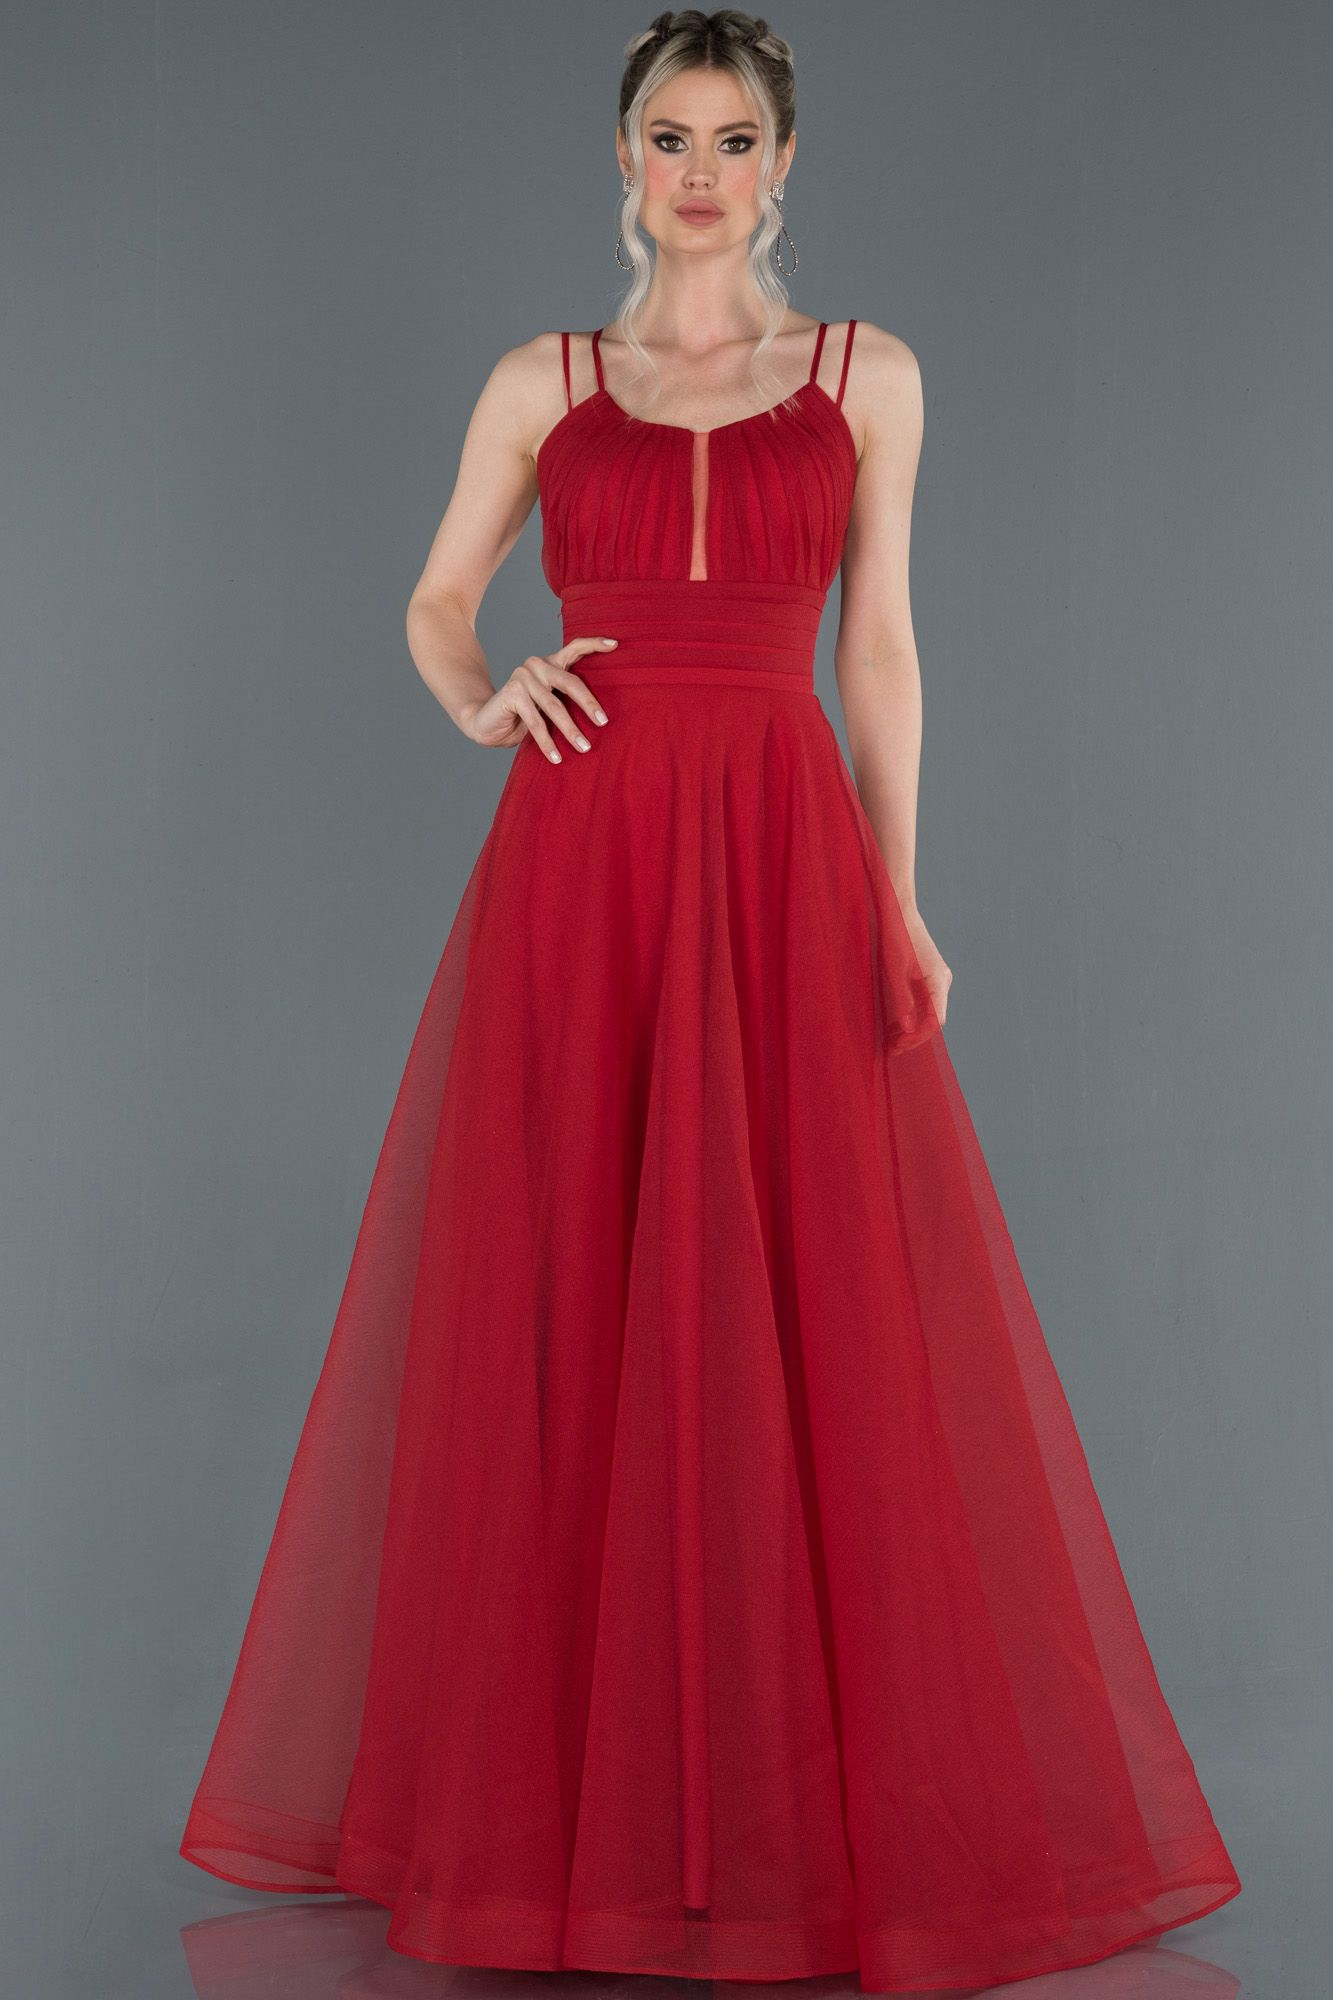 Kirmizi Ip Askili Sirt Dekolteli Abiye Elbise Abu1208 2020 Elbise Modelleri The Dress Elbise